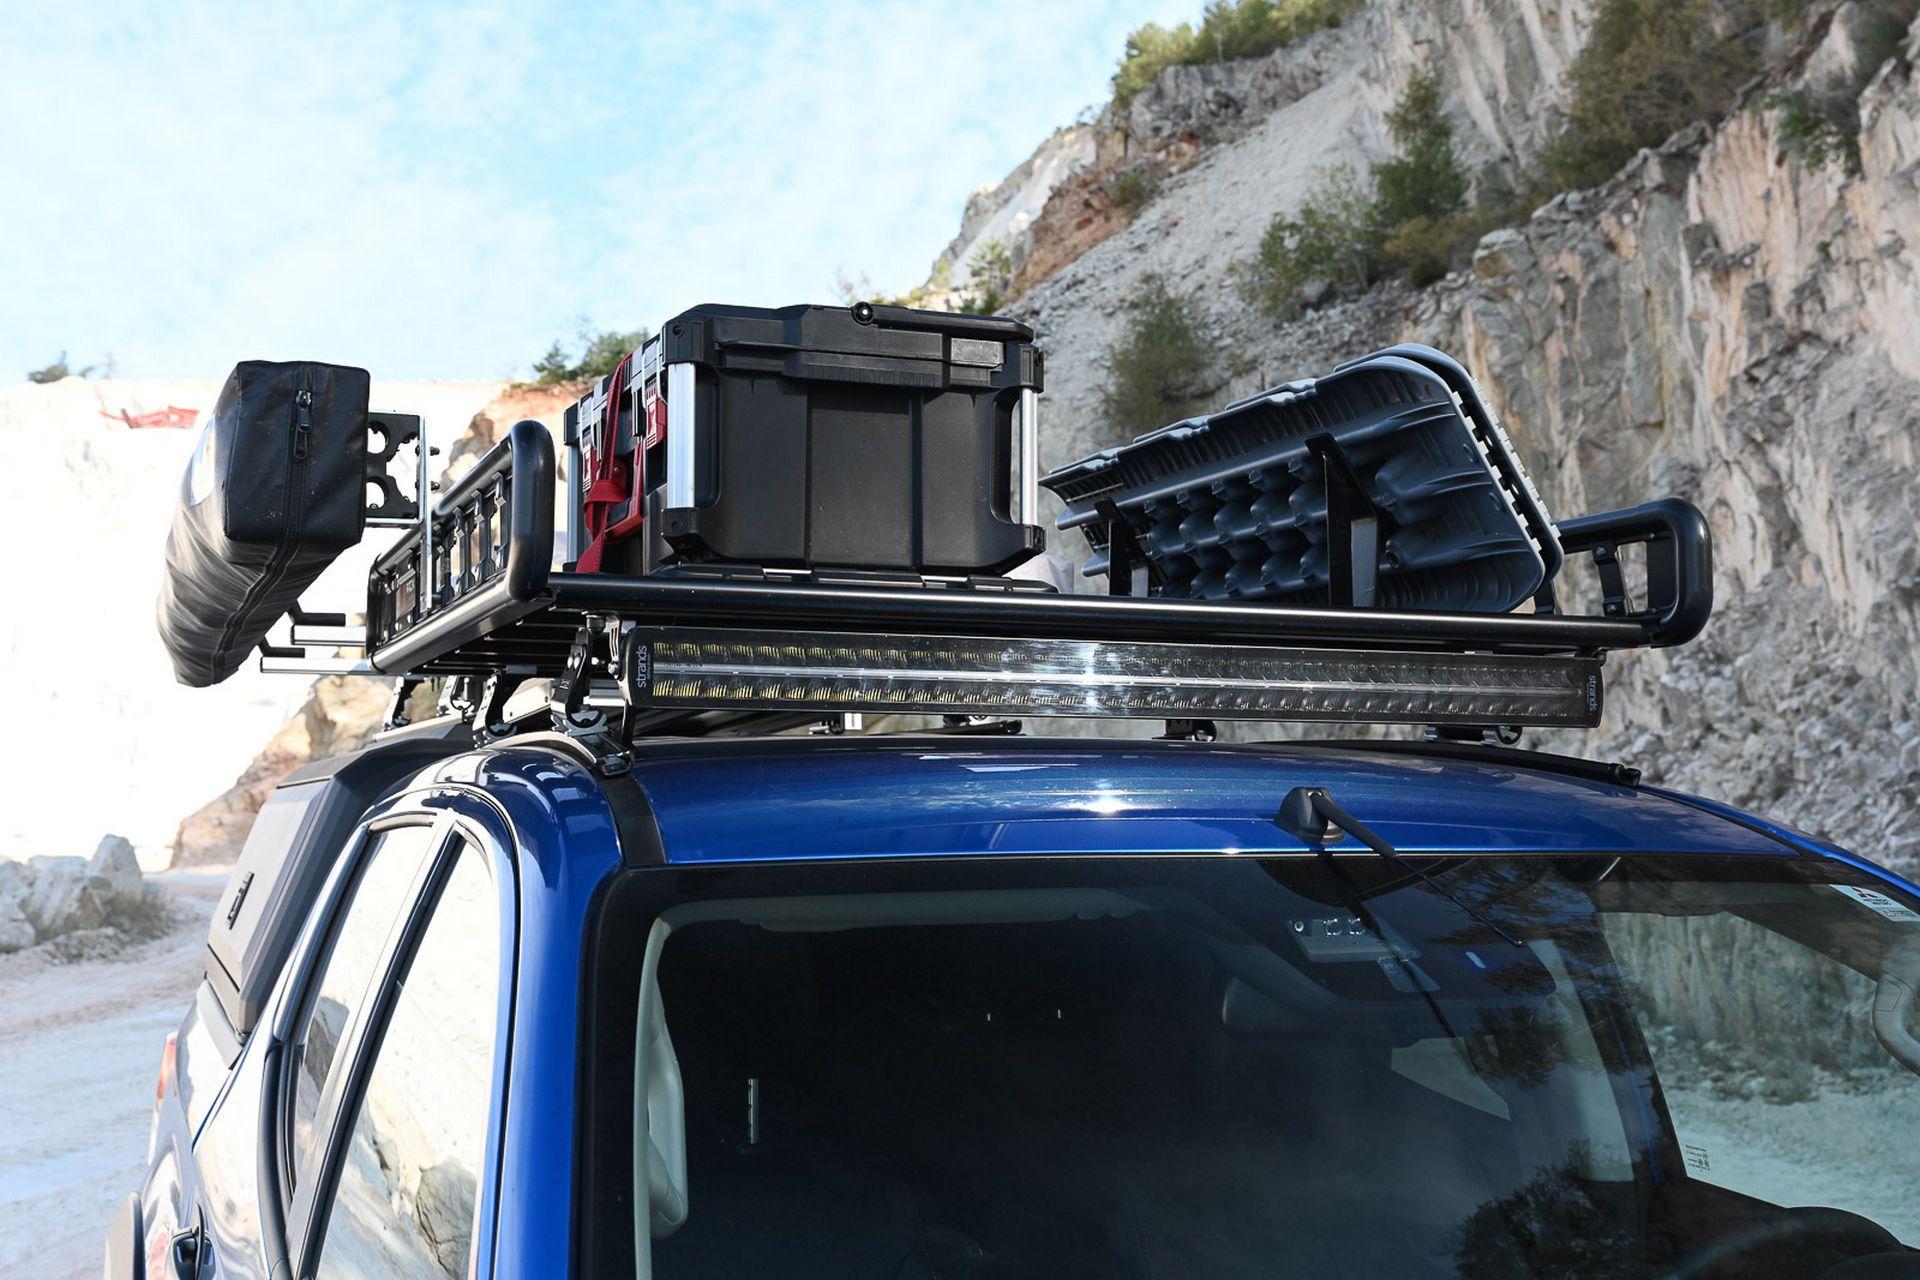 Mitsubishi-L200-Camping-Accessories-1